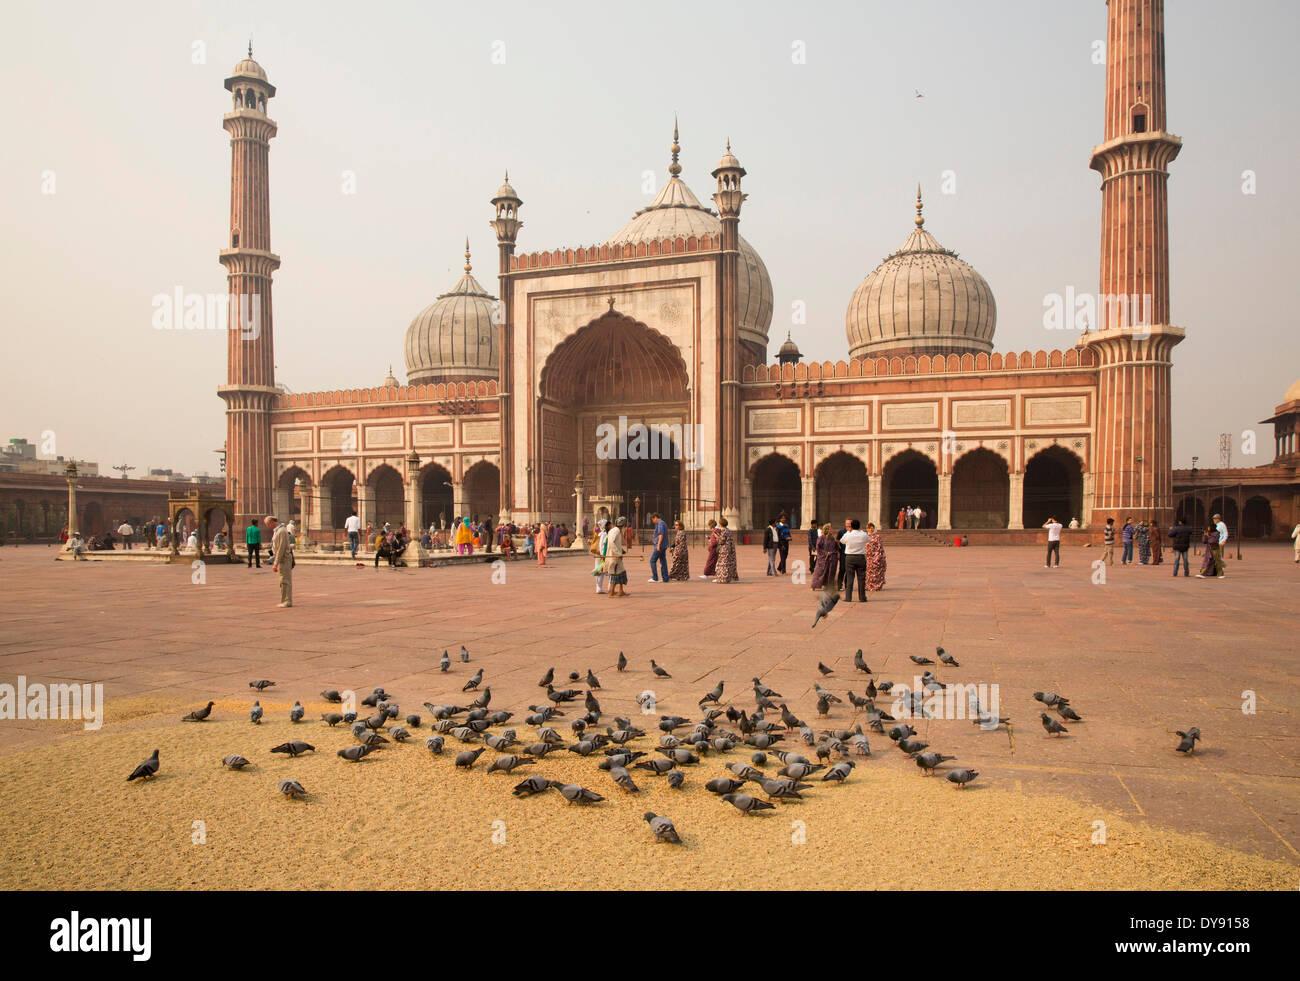 Jama Masjid, mosque, Old Delhi, Delhi, masterpiece, Mogul's architecture, Asia, church, religion, towers, place, pigeons - Stock Image